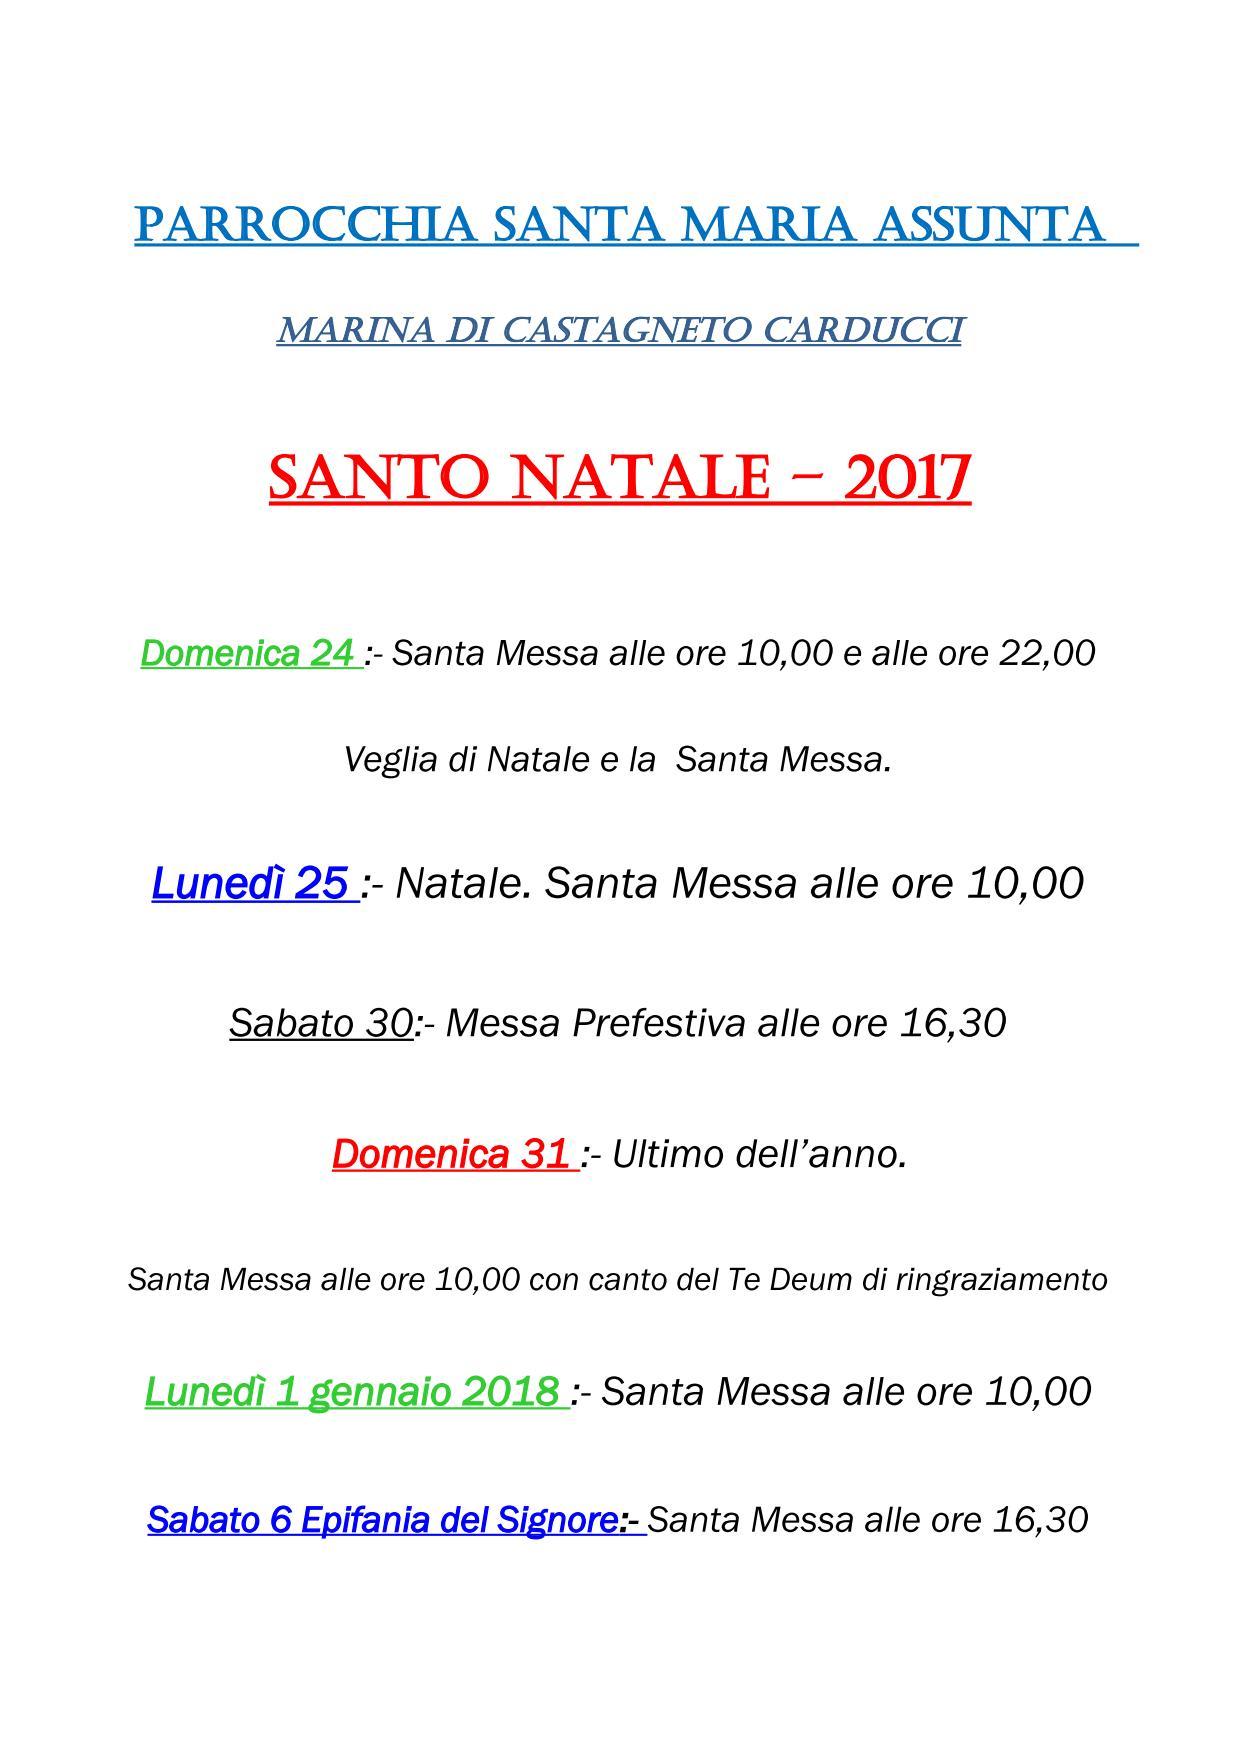 Parrocchia Santa Maria Assunta - Natale2017